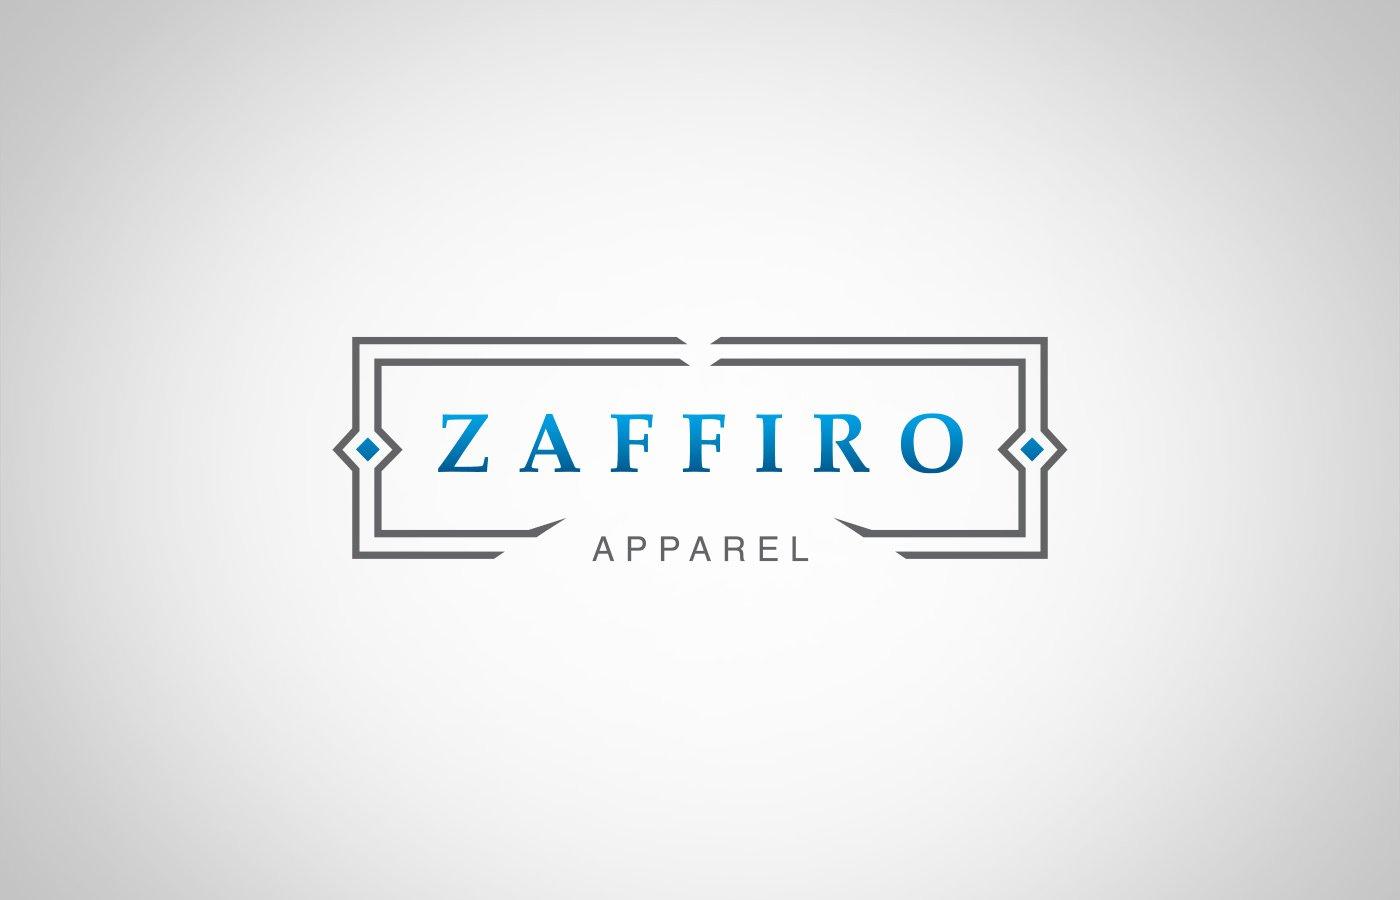 Edmonton Graphic Design | Zaffiro Apparel Logo